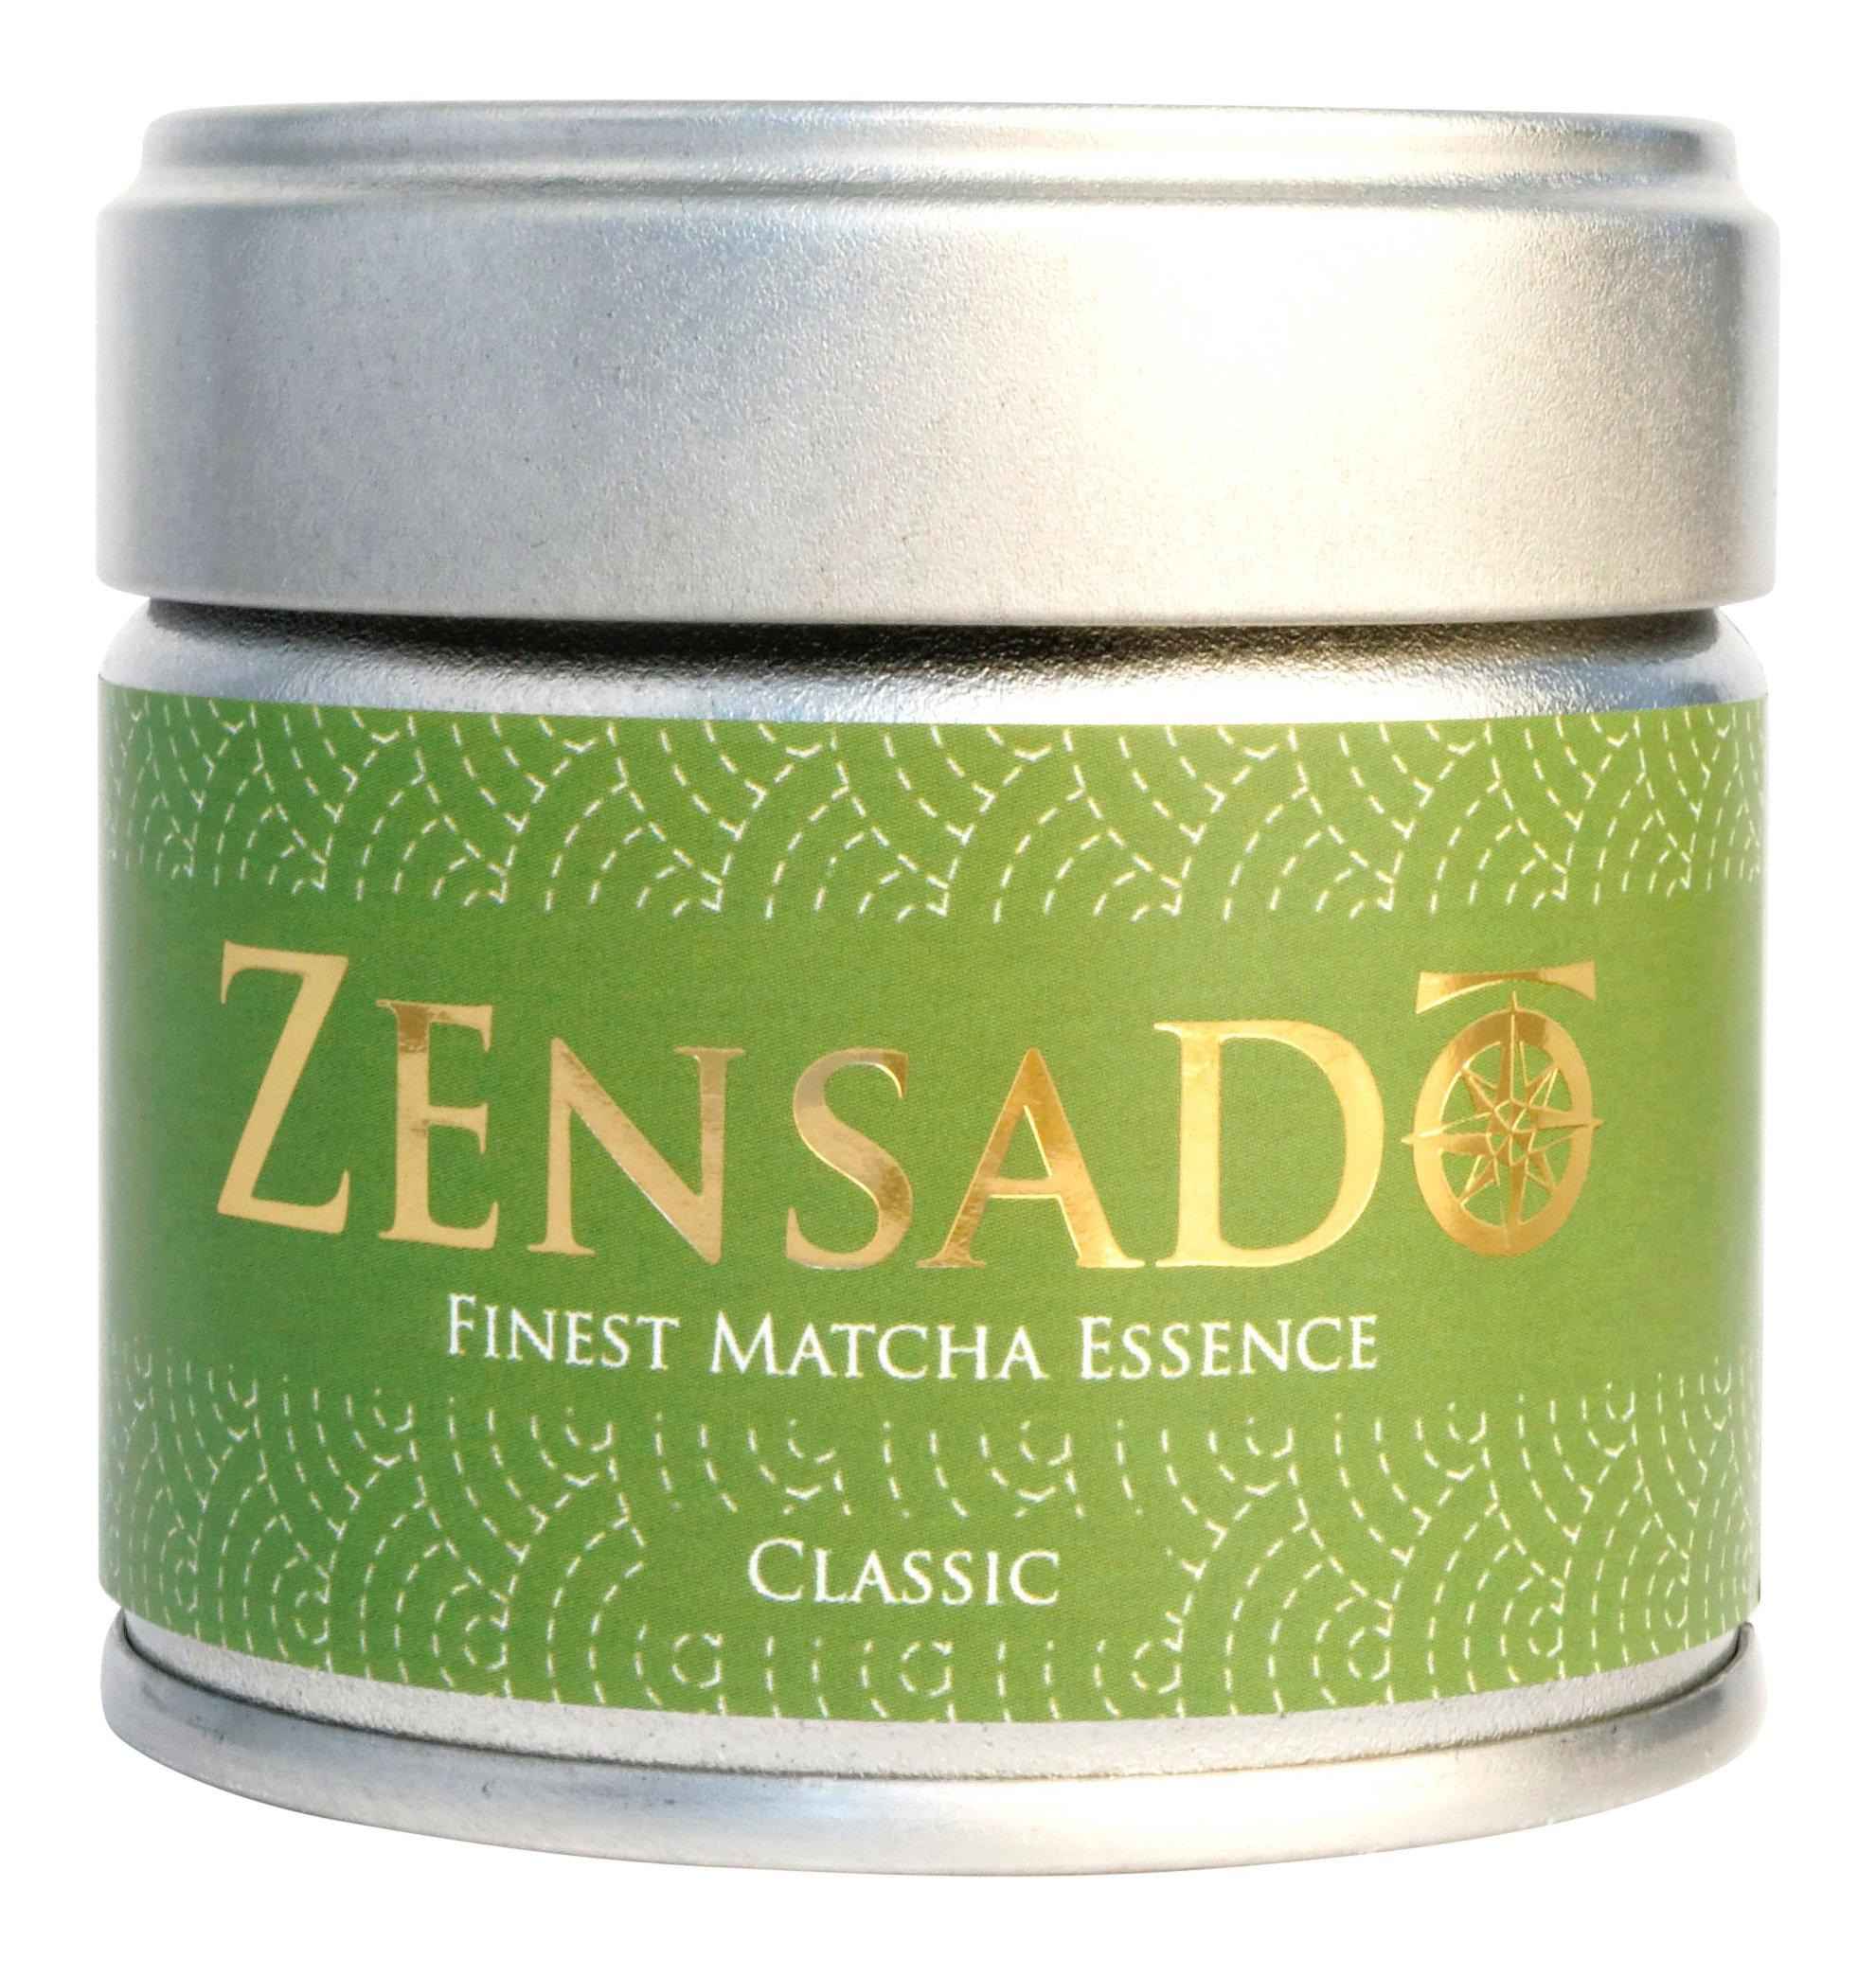 ZENSADO-CLASSIC-FINEST-MATCHA-ESSENCE-Matcha-Tee-Pulver-Grntee-Pulver-fr-Matcha-Getrnk-Matcha-Smoothies-Matcha-Latte-Premium-Qualitt-aus-Japan-30g